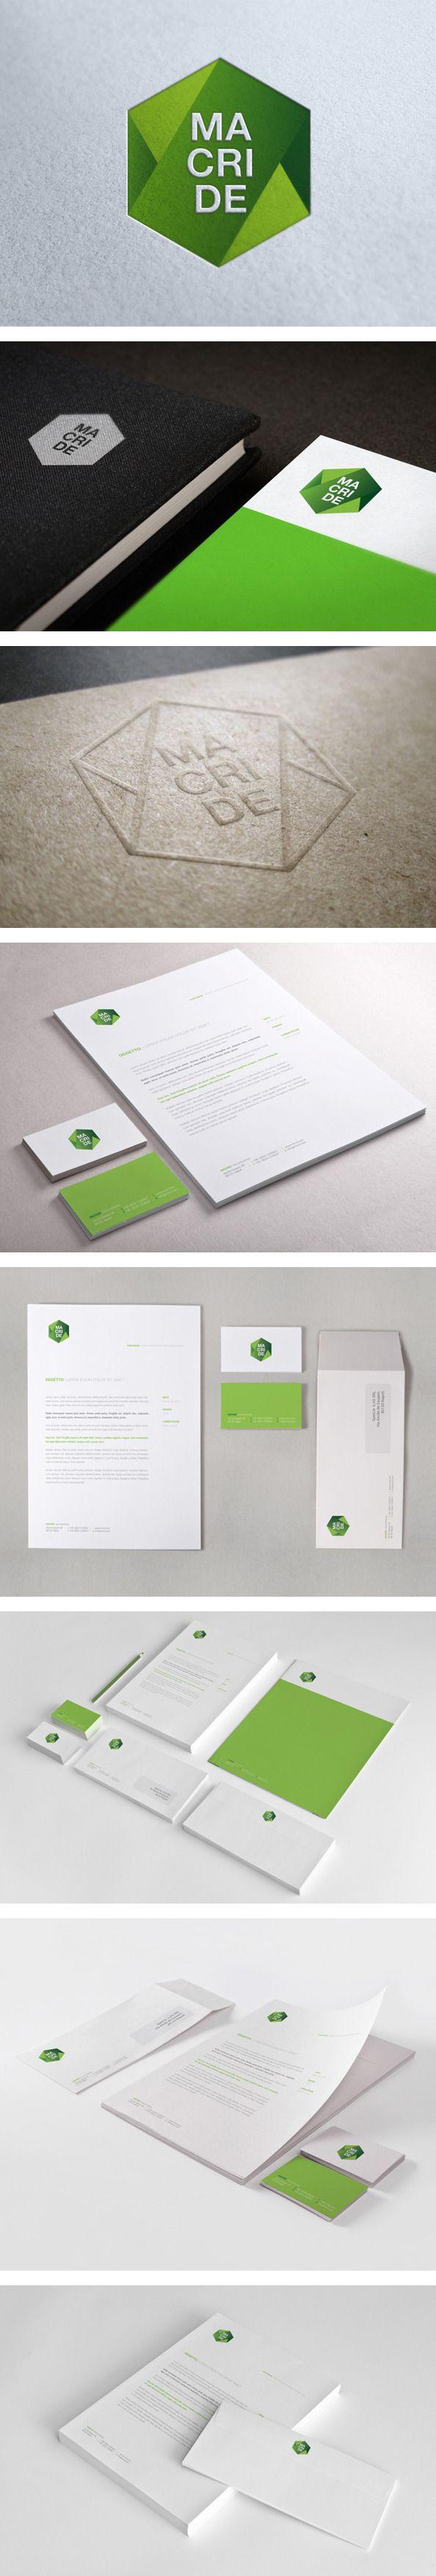 Corporate Id. by Maurizio Pagnozzi | #stationary #corporate #design #corporatedesign #identity #branding #marketing < repinned by www.BlickeDeeler.de | Visit our website: www.blickedeeler.de/leistungen/corporate-design